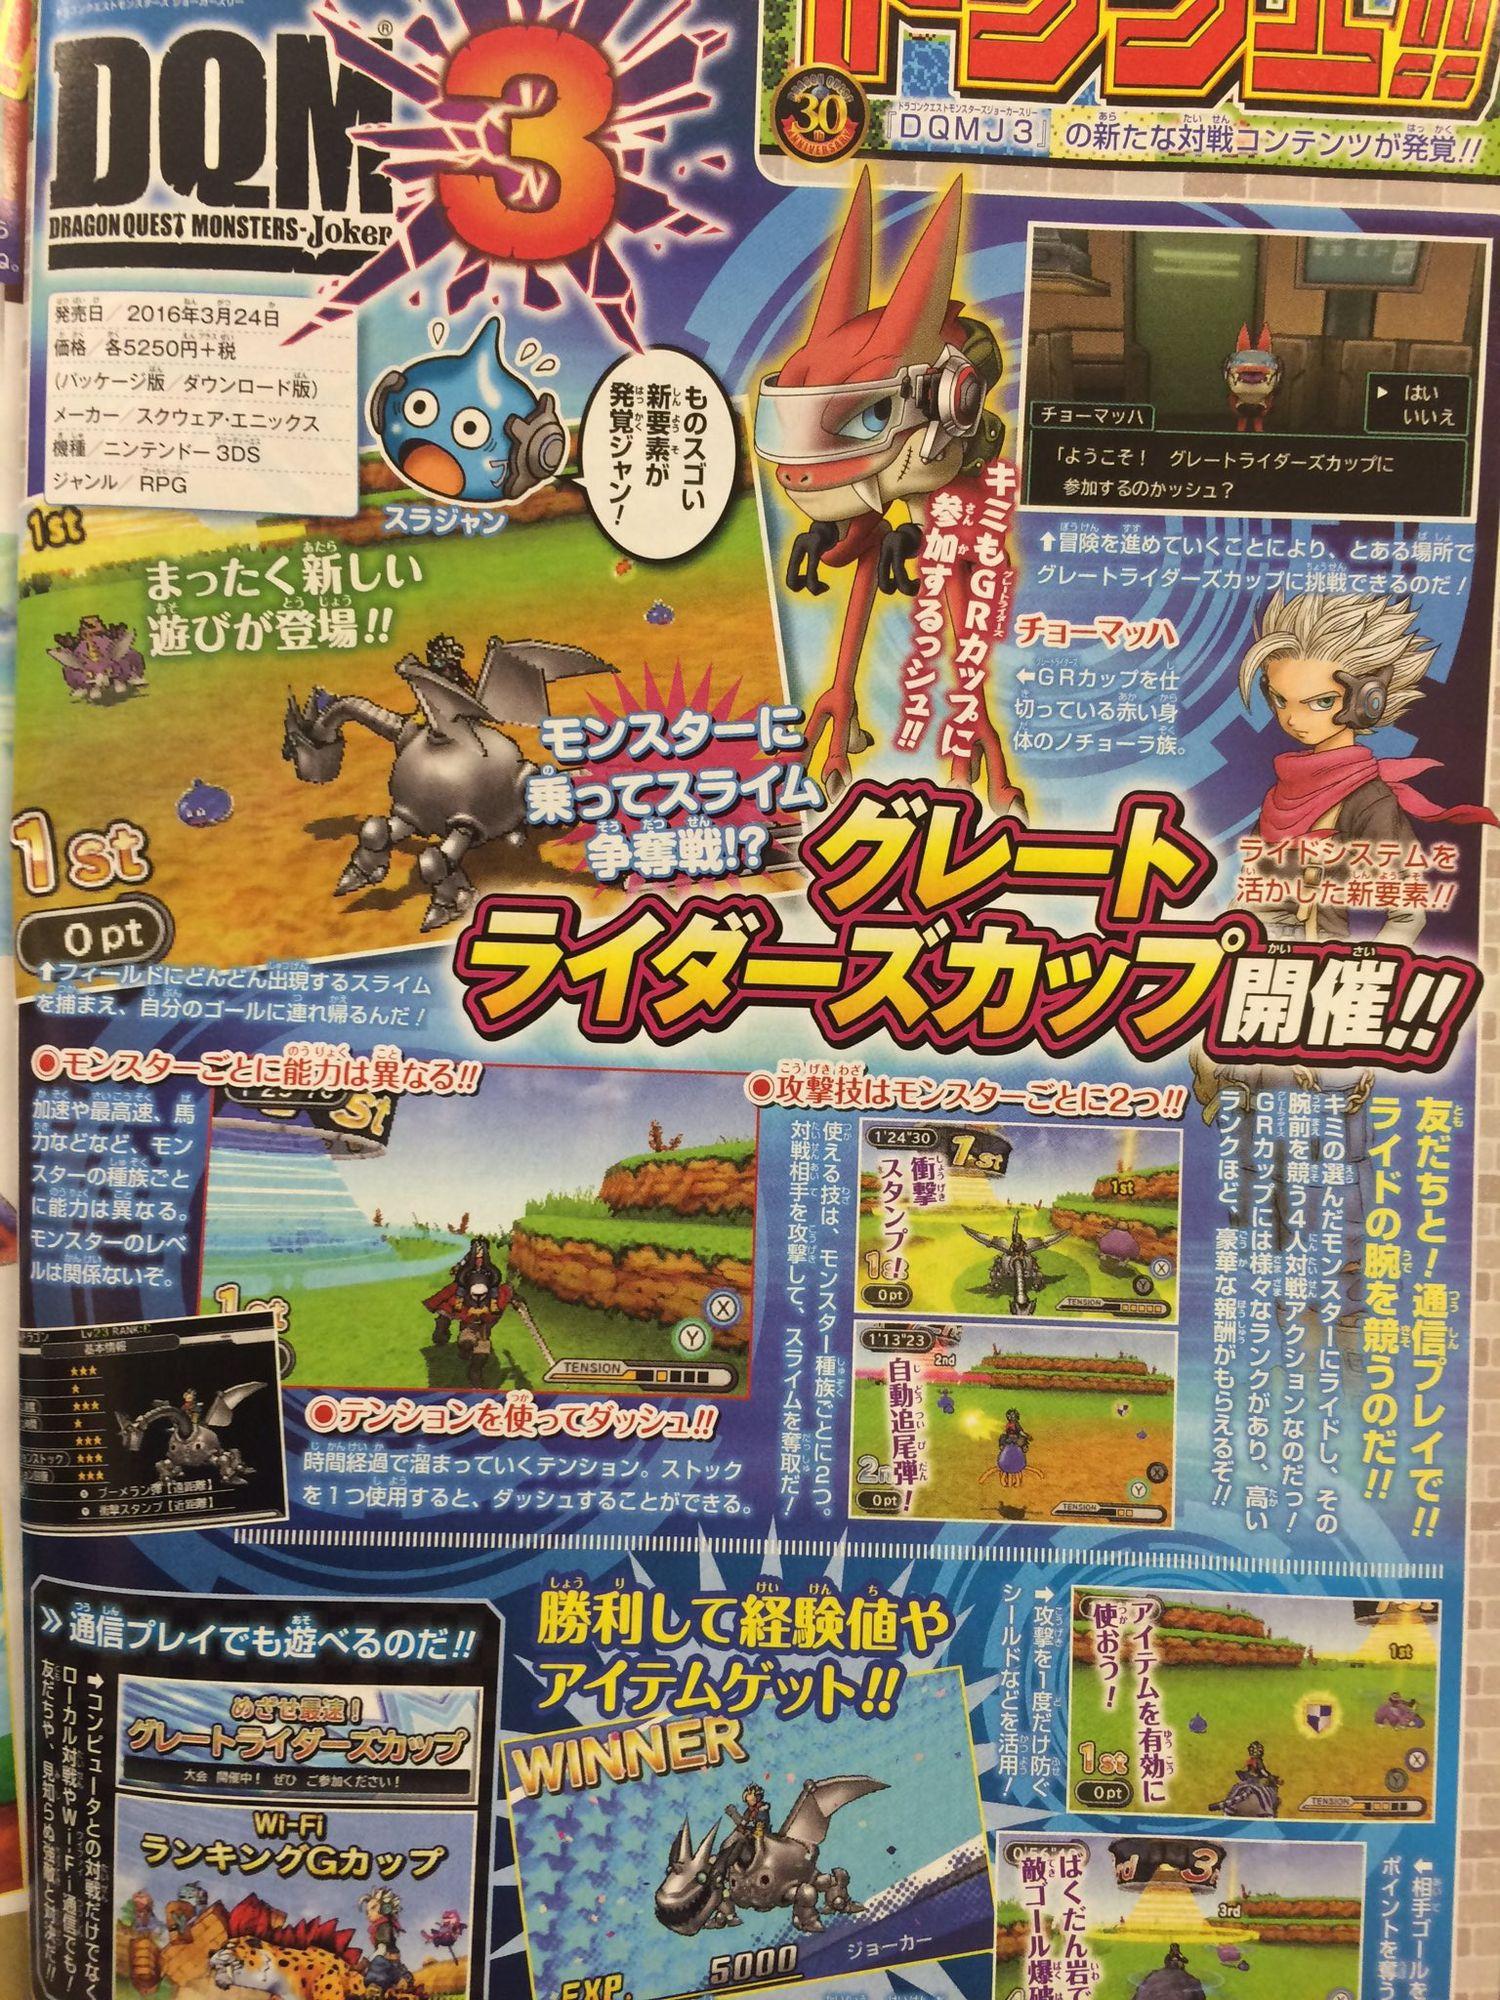 dragon-quest-monsters-joker-3